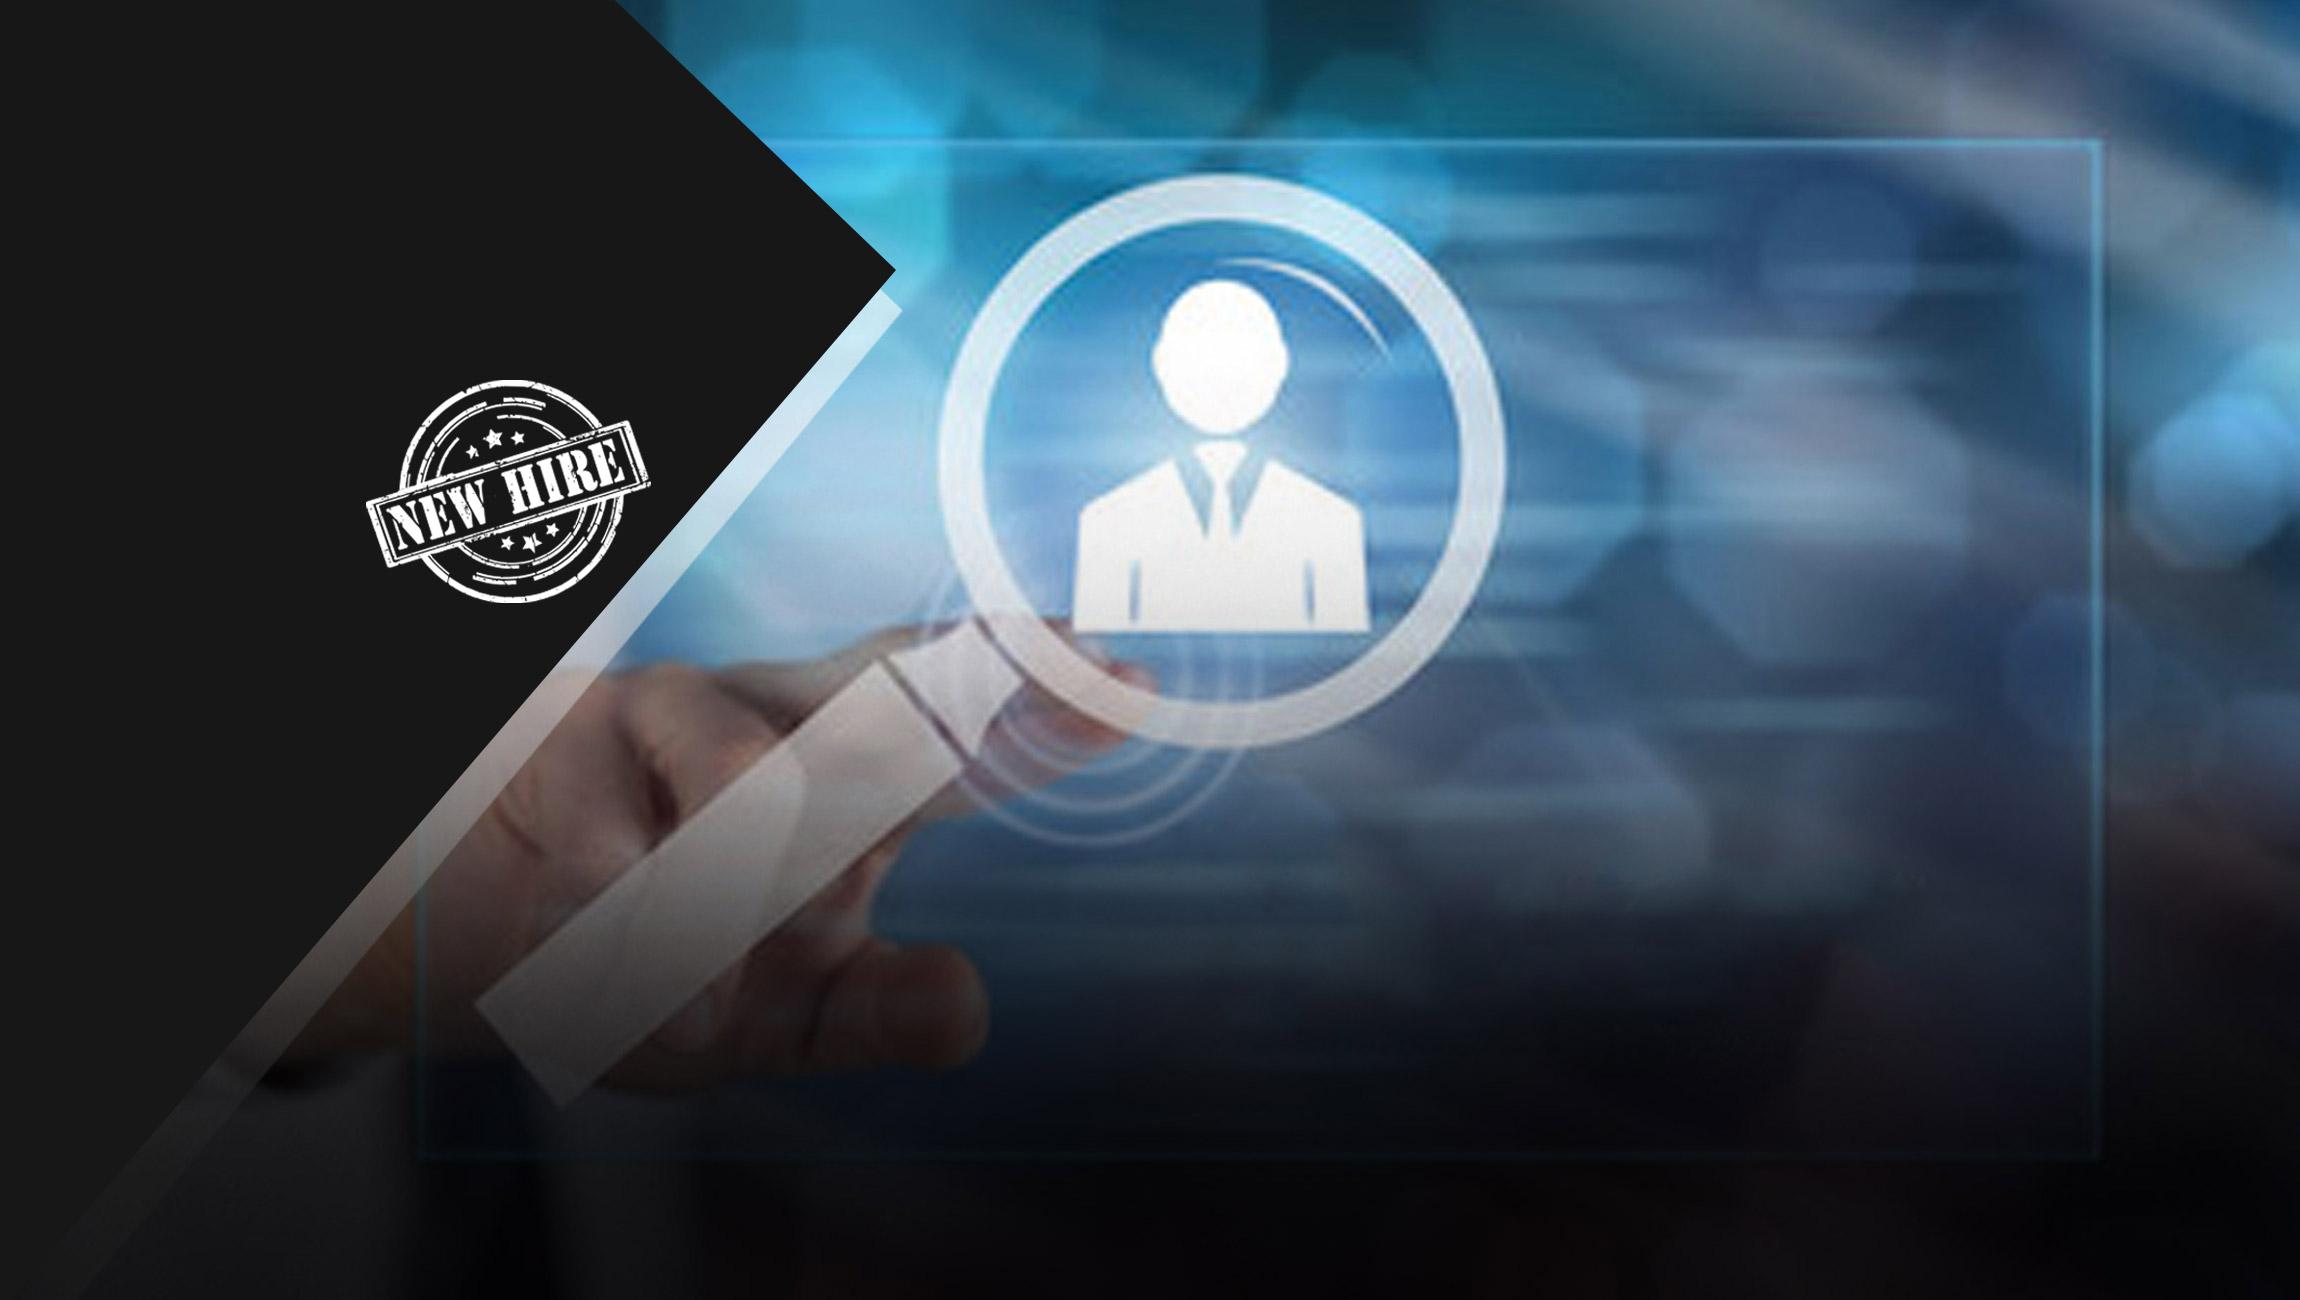 Deputy Locks-in GTM Leadership Team, Appoints Eventbrite, ServiceTitan and Sitetracker Alums